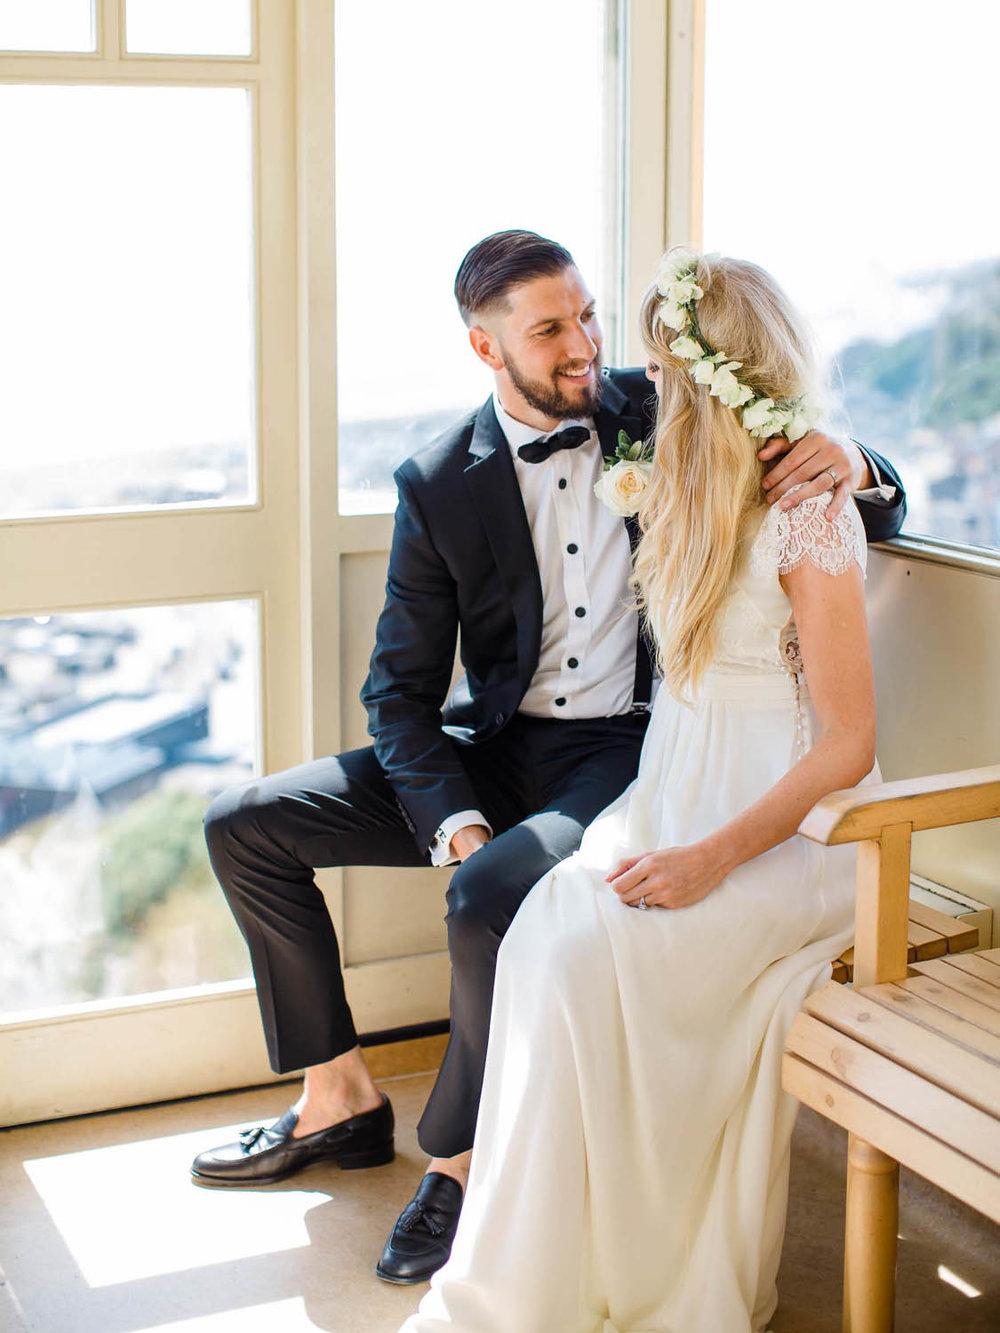 Amy O'Boyle Photography, Destination & UK Fine Art Film Wedding Photographer, Hastings Wedding-21.jpg